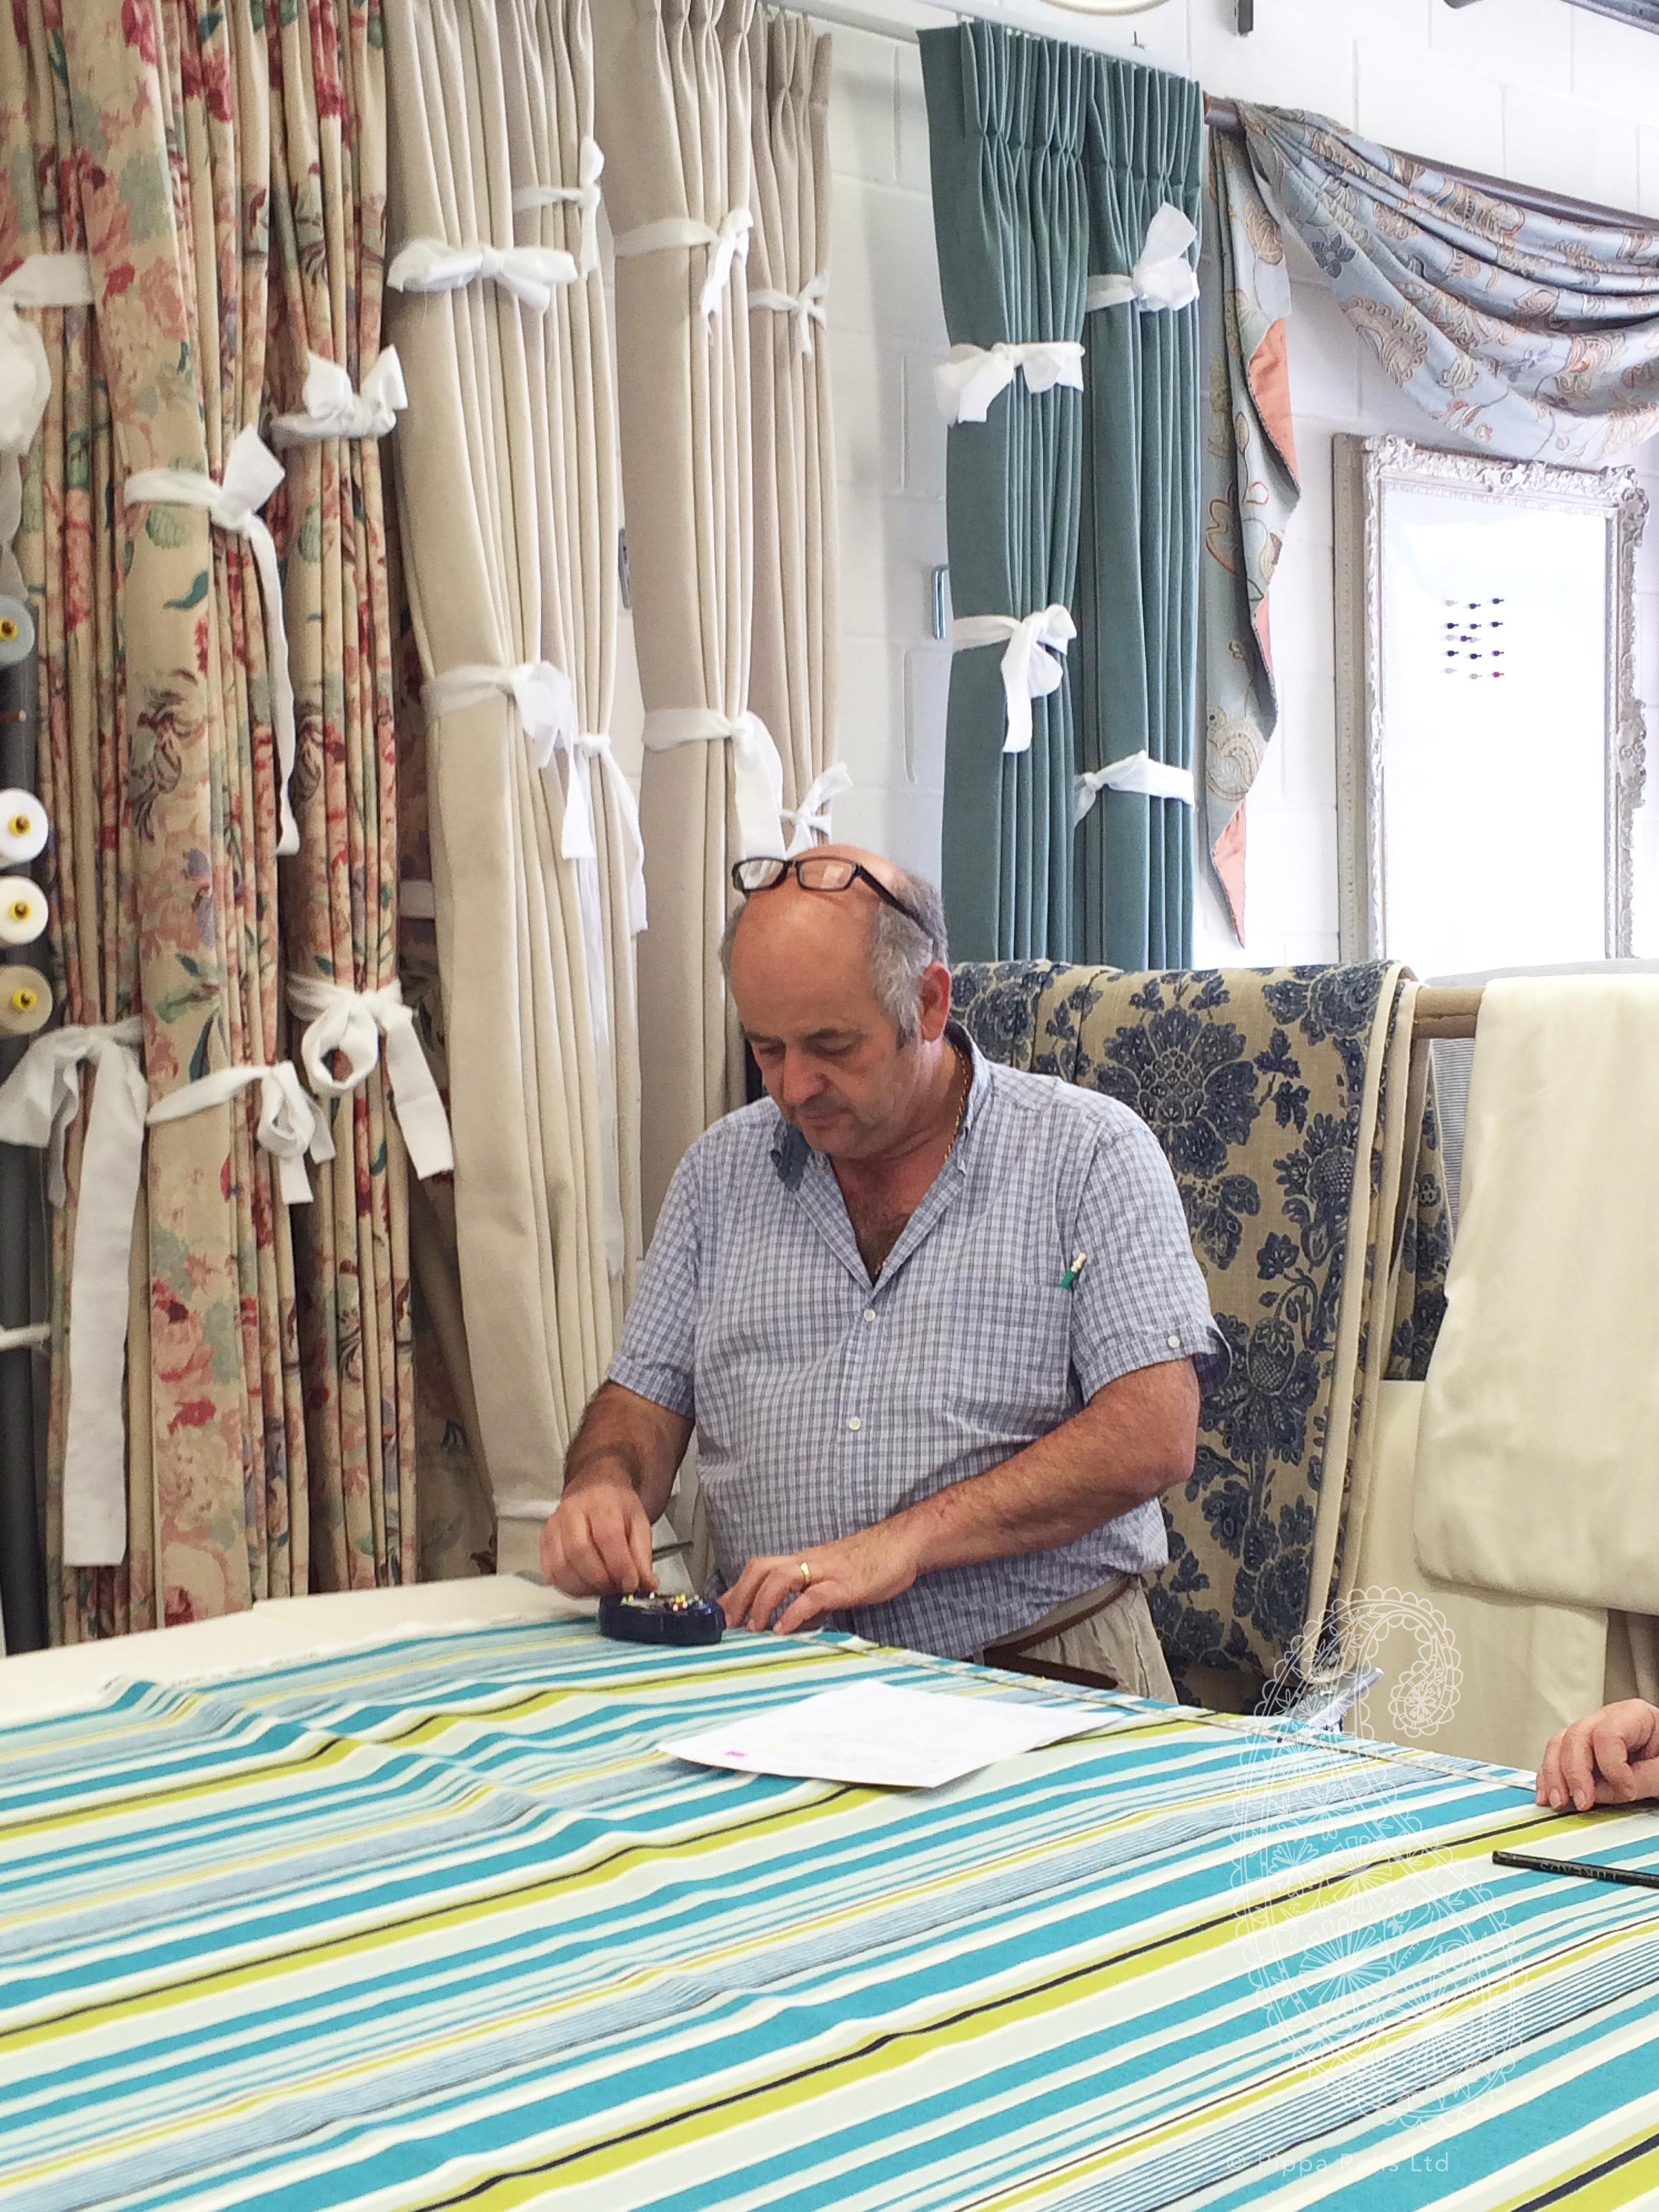 Workshop Miguel striped fabric Pippa Rolls Limited jpeg.jpg